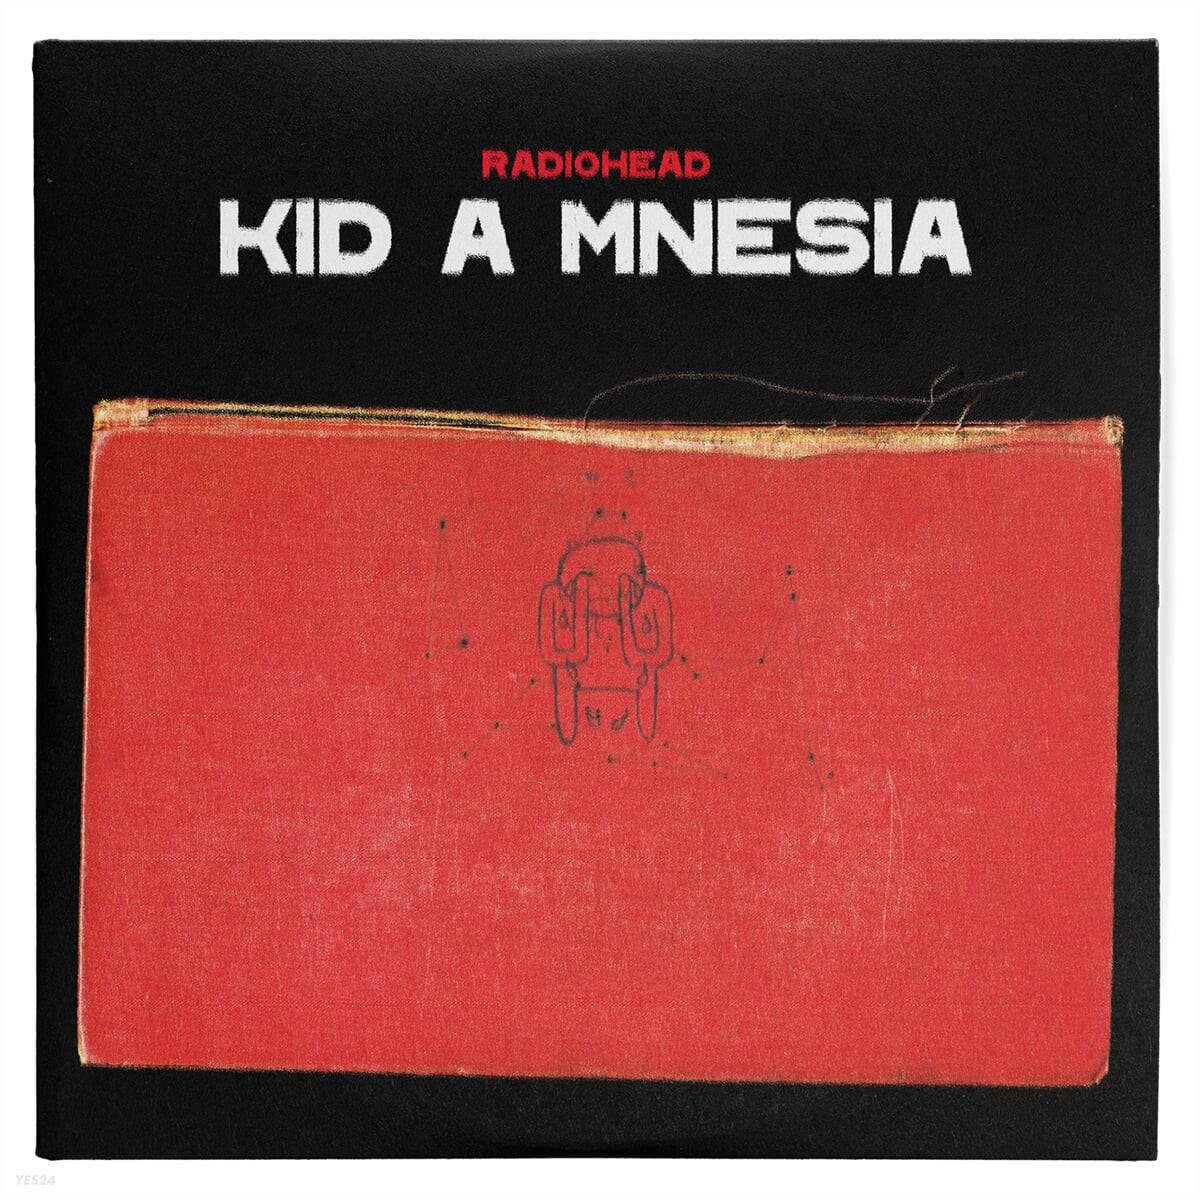 Radiohead (라디오헤드) - KID A MNESIA